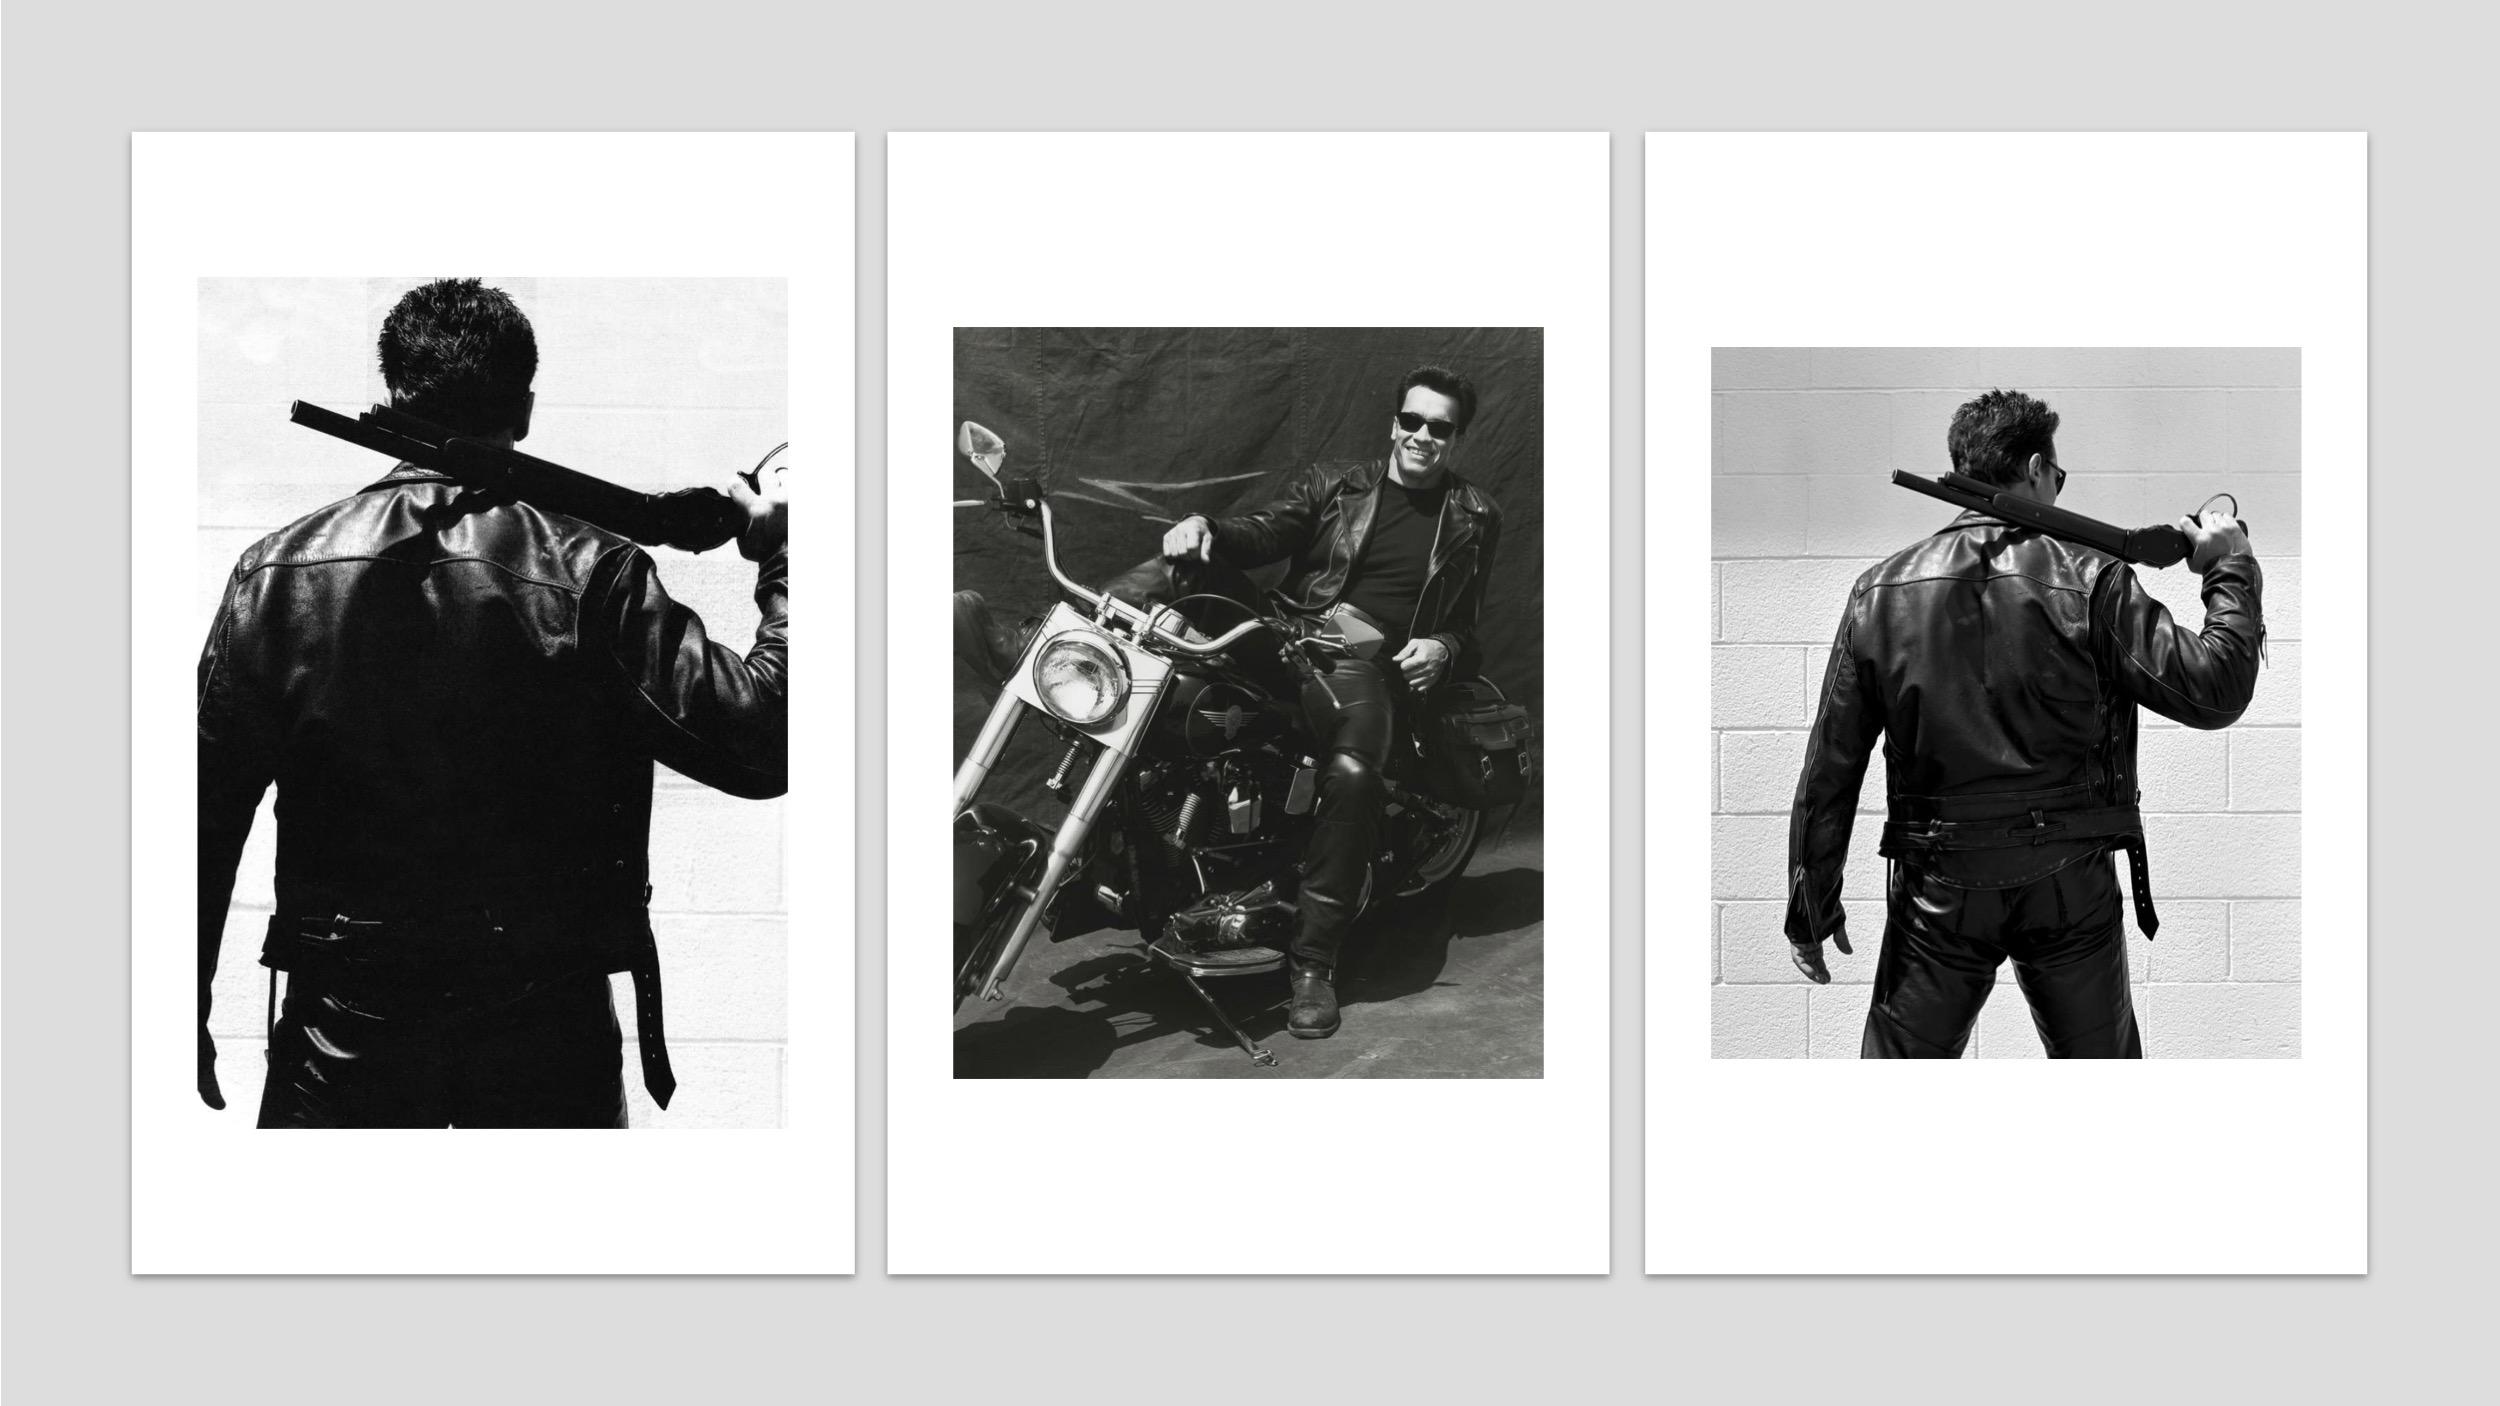 Terminator Jackets collage photo